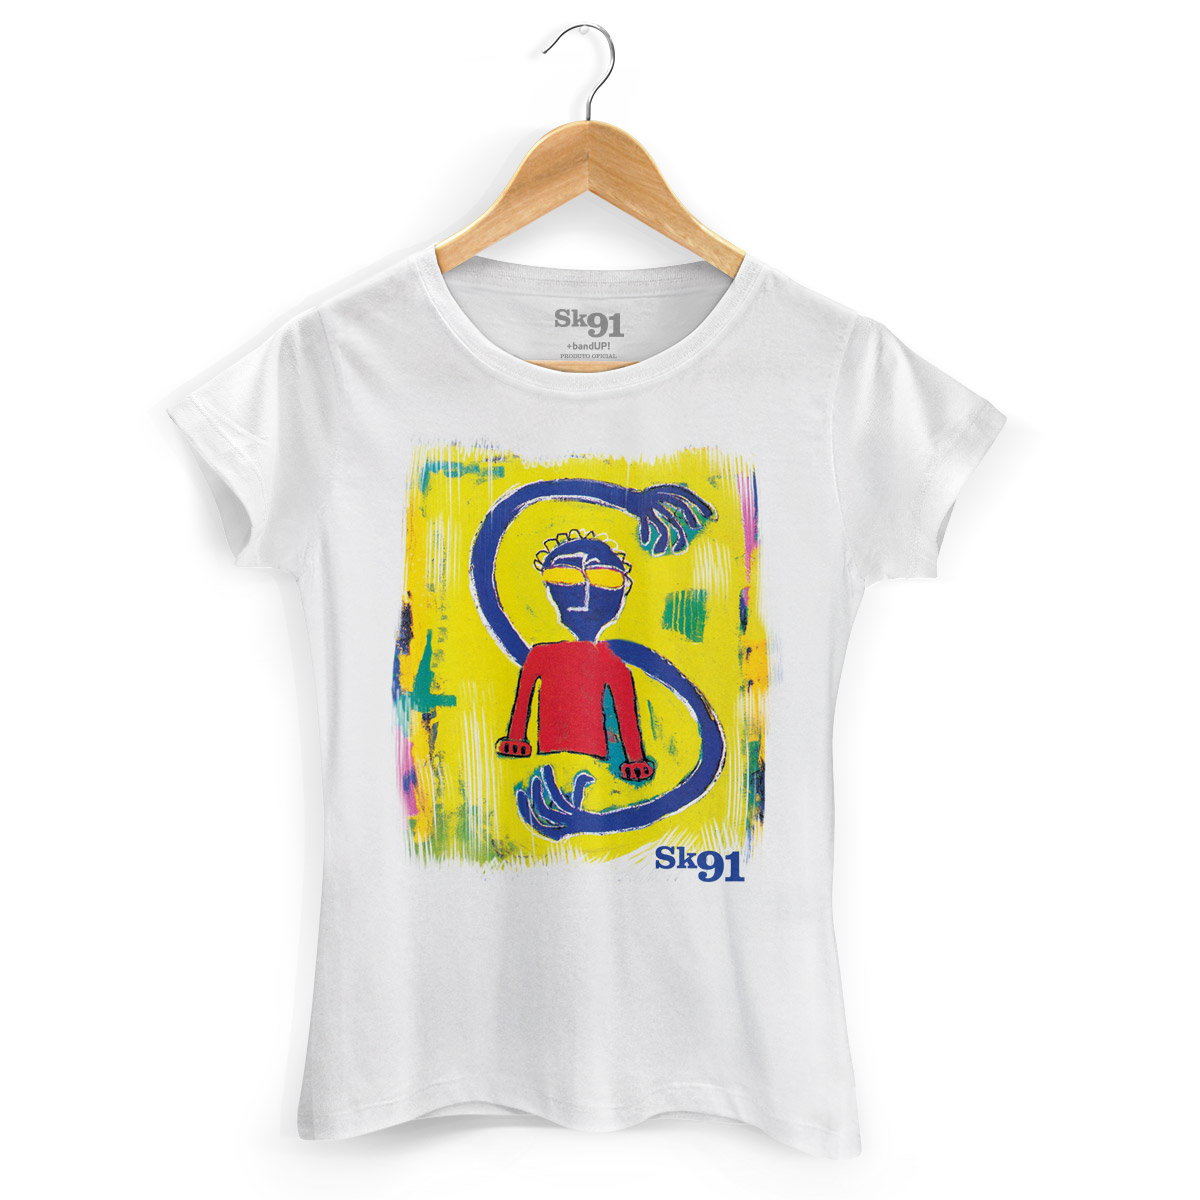 Camiseta Feminina SK91 Siderado